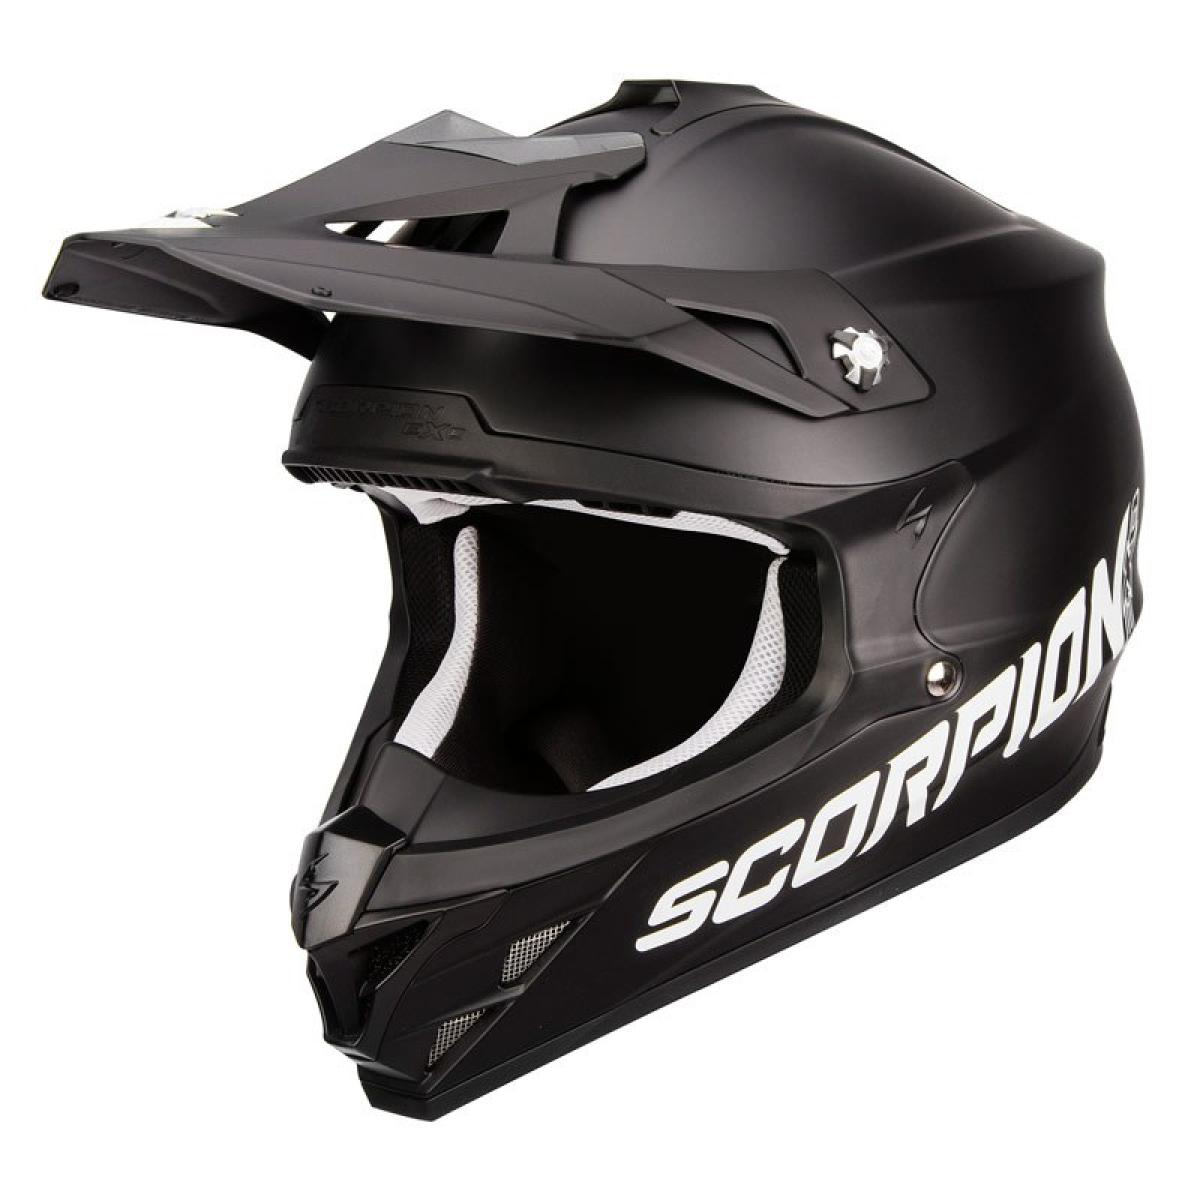 casque moto cross scorpion exo vx 15 evo air solid noir mat. Black Bedroom Furniture Sets. Home Design Ideas